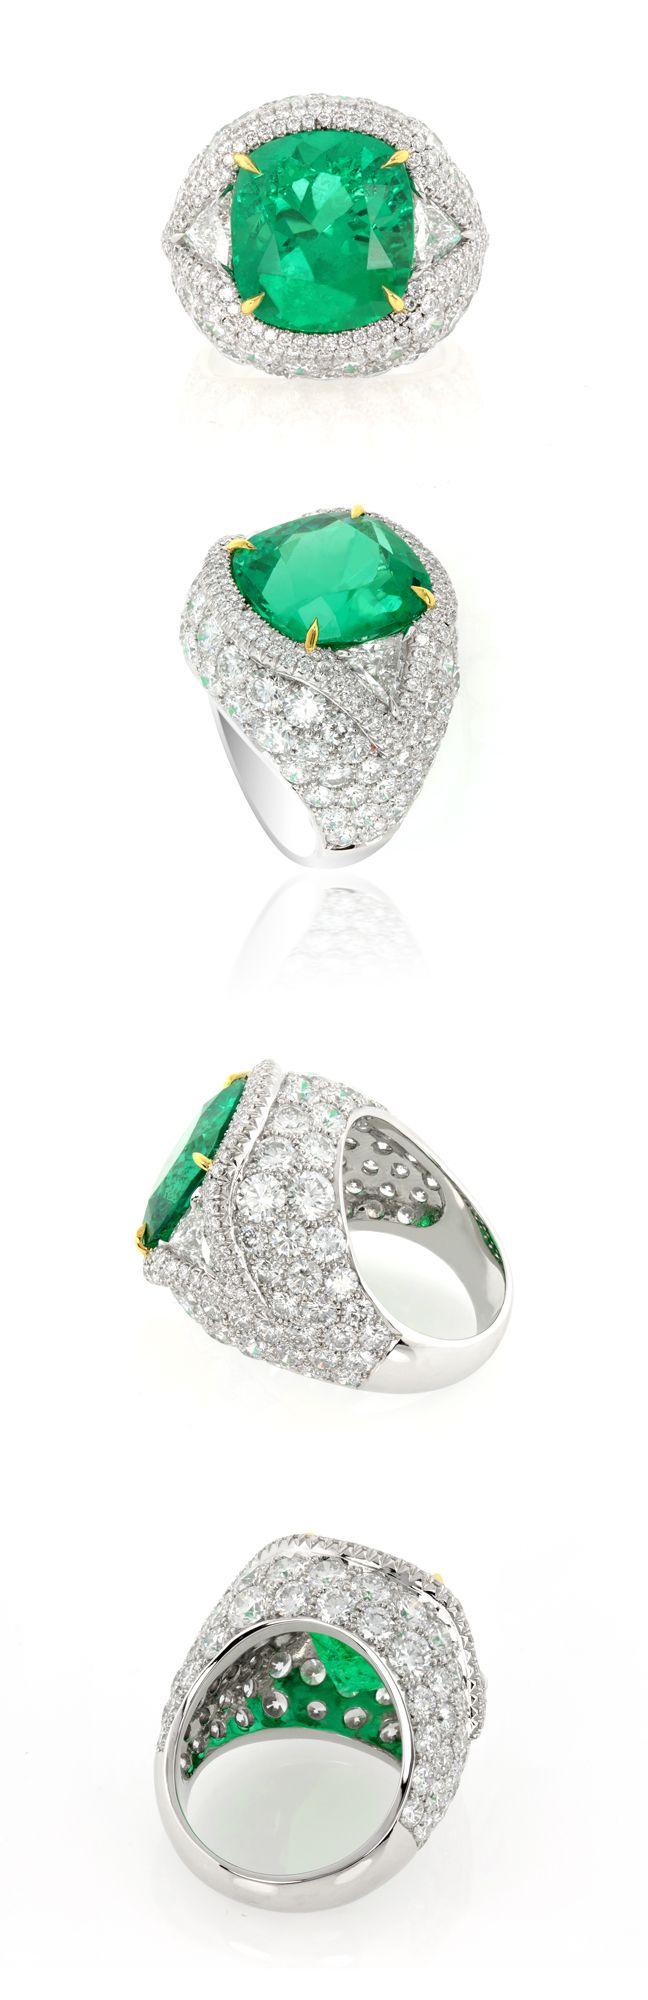 best แหวนเพชร images on pinterest rings gemstones and